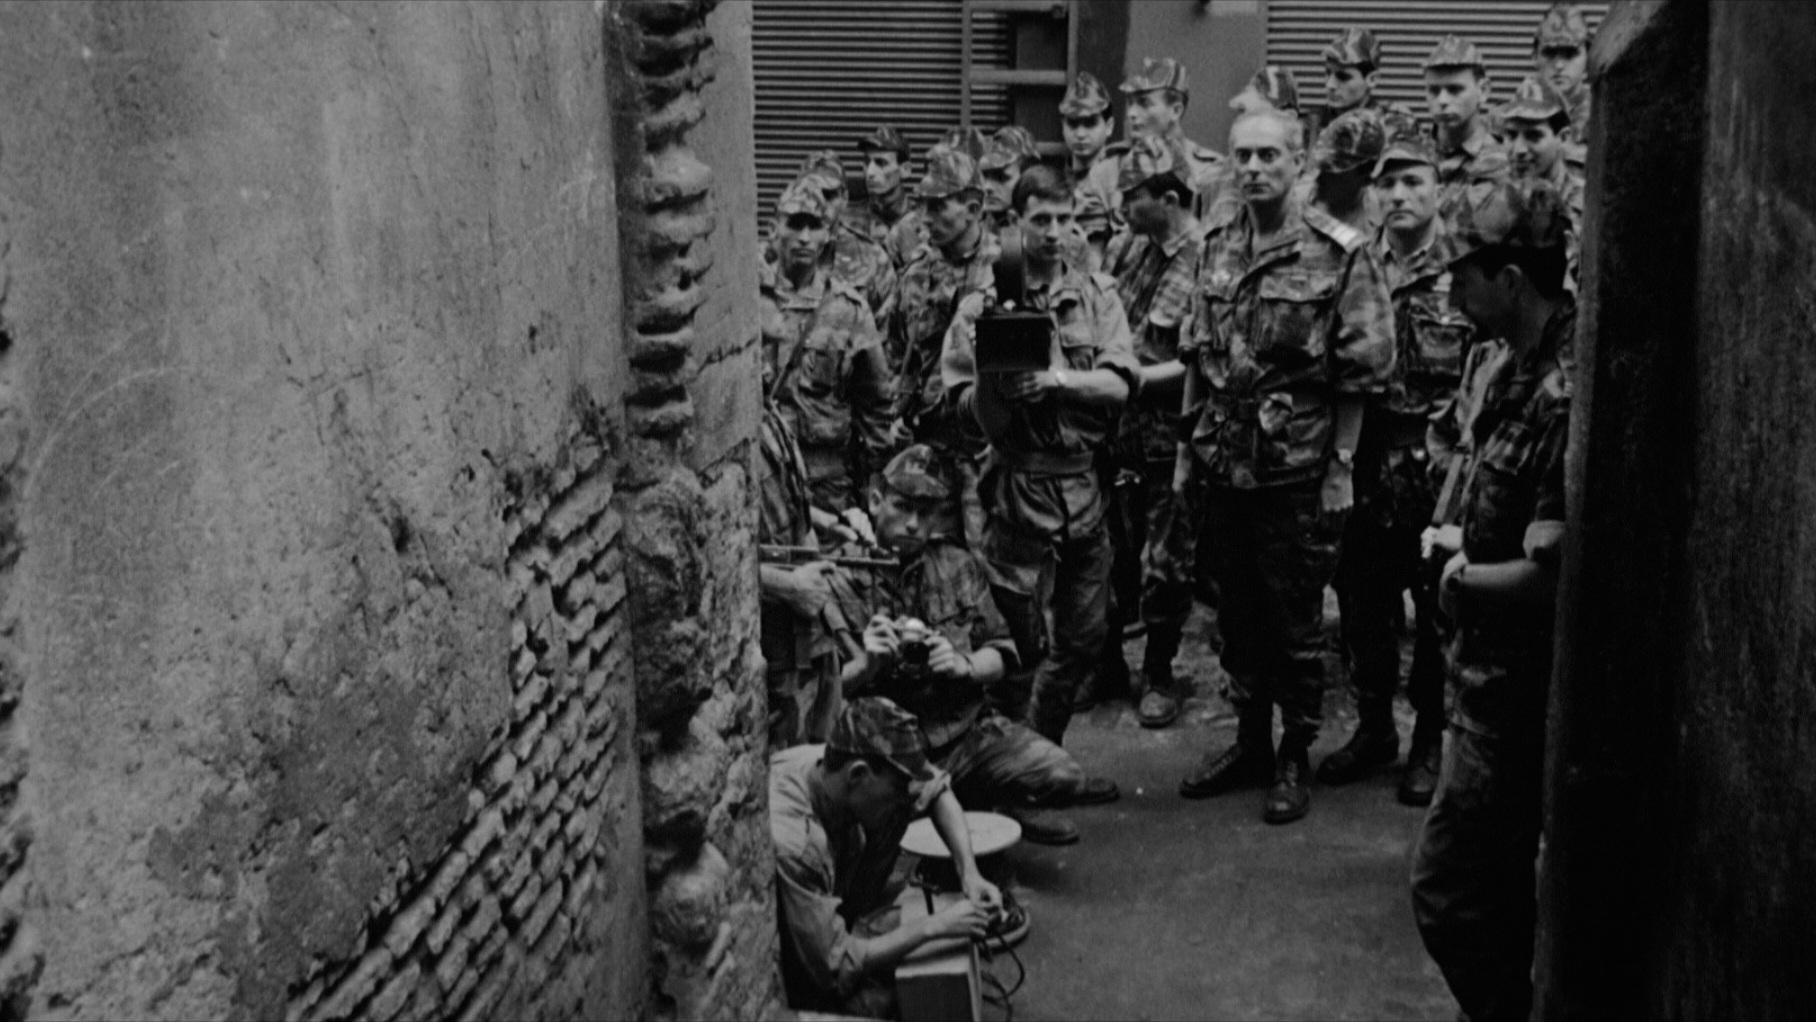 #1) The Battle of Algiers - (1966 - dir. Gillo Pontecorvo)